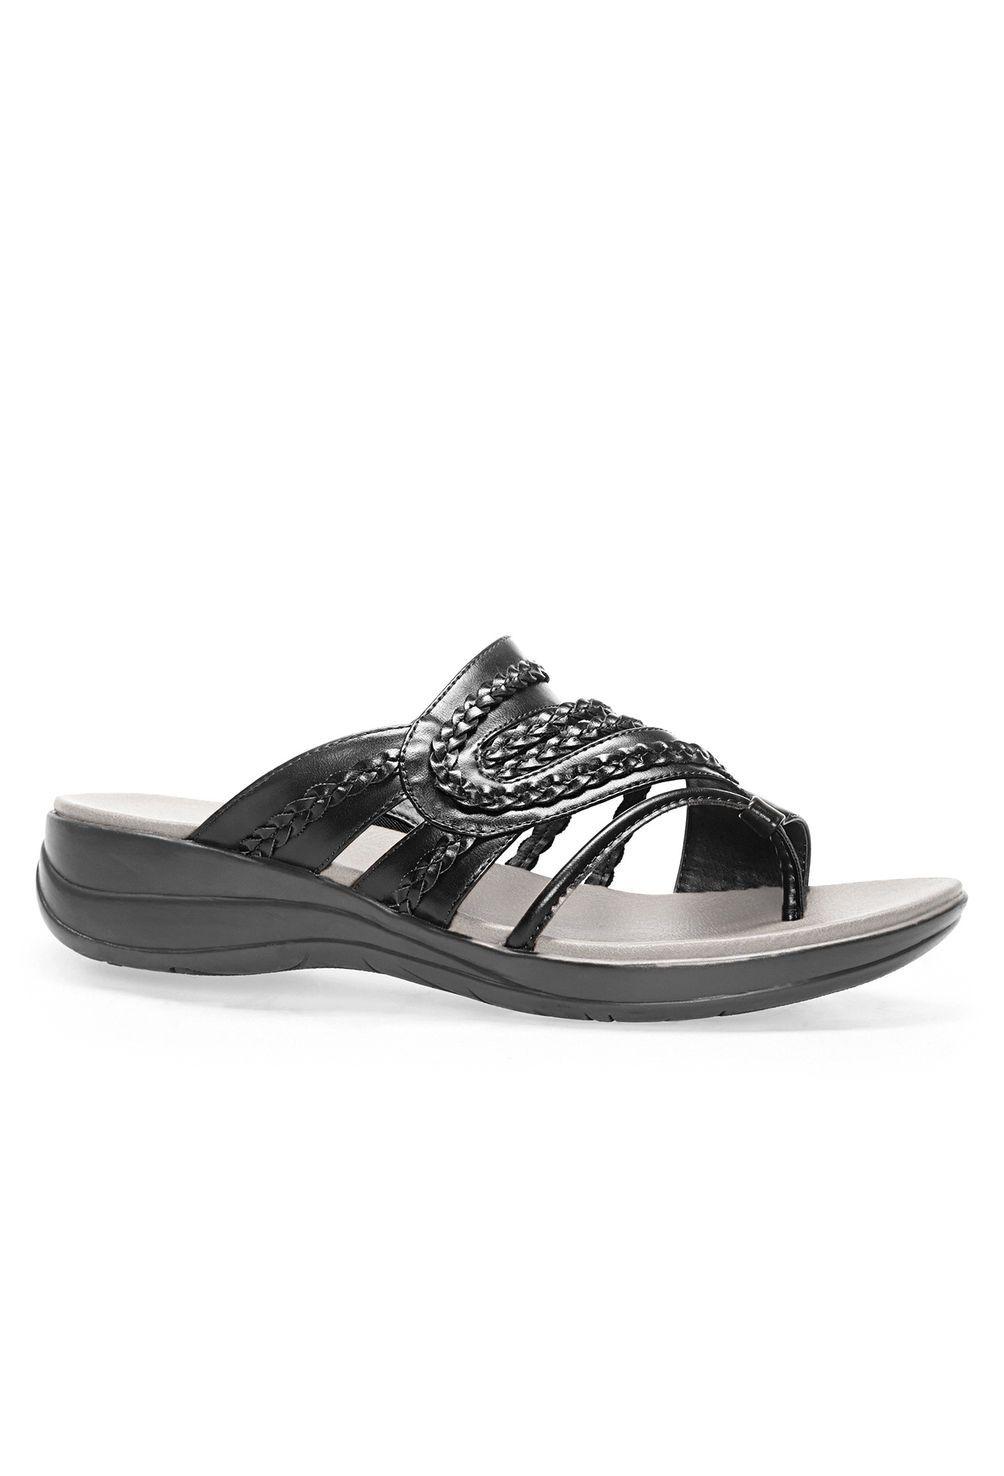 24d5744771a3 Jayda Braided Cloudwalkers® Comfort Sandal-Wide Width Sandal-Avenue ...